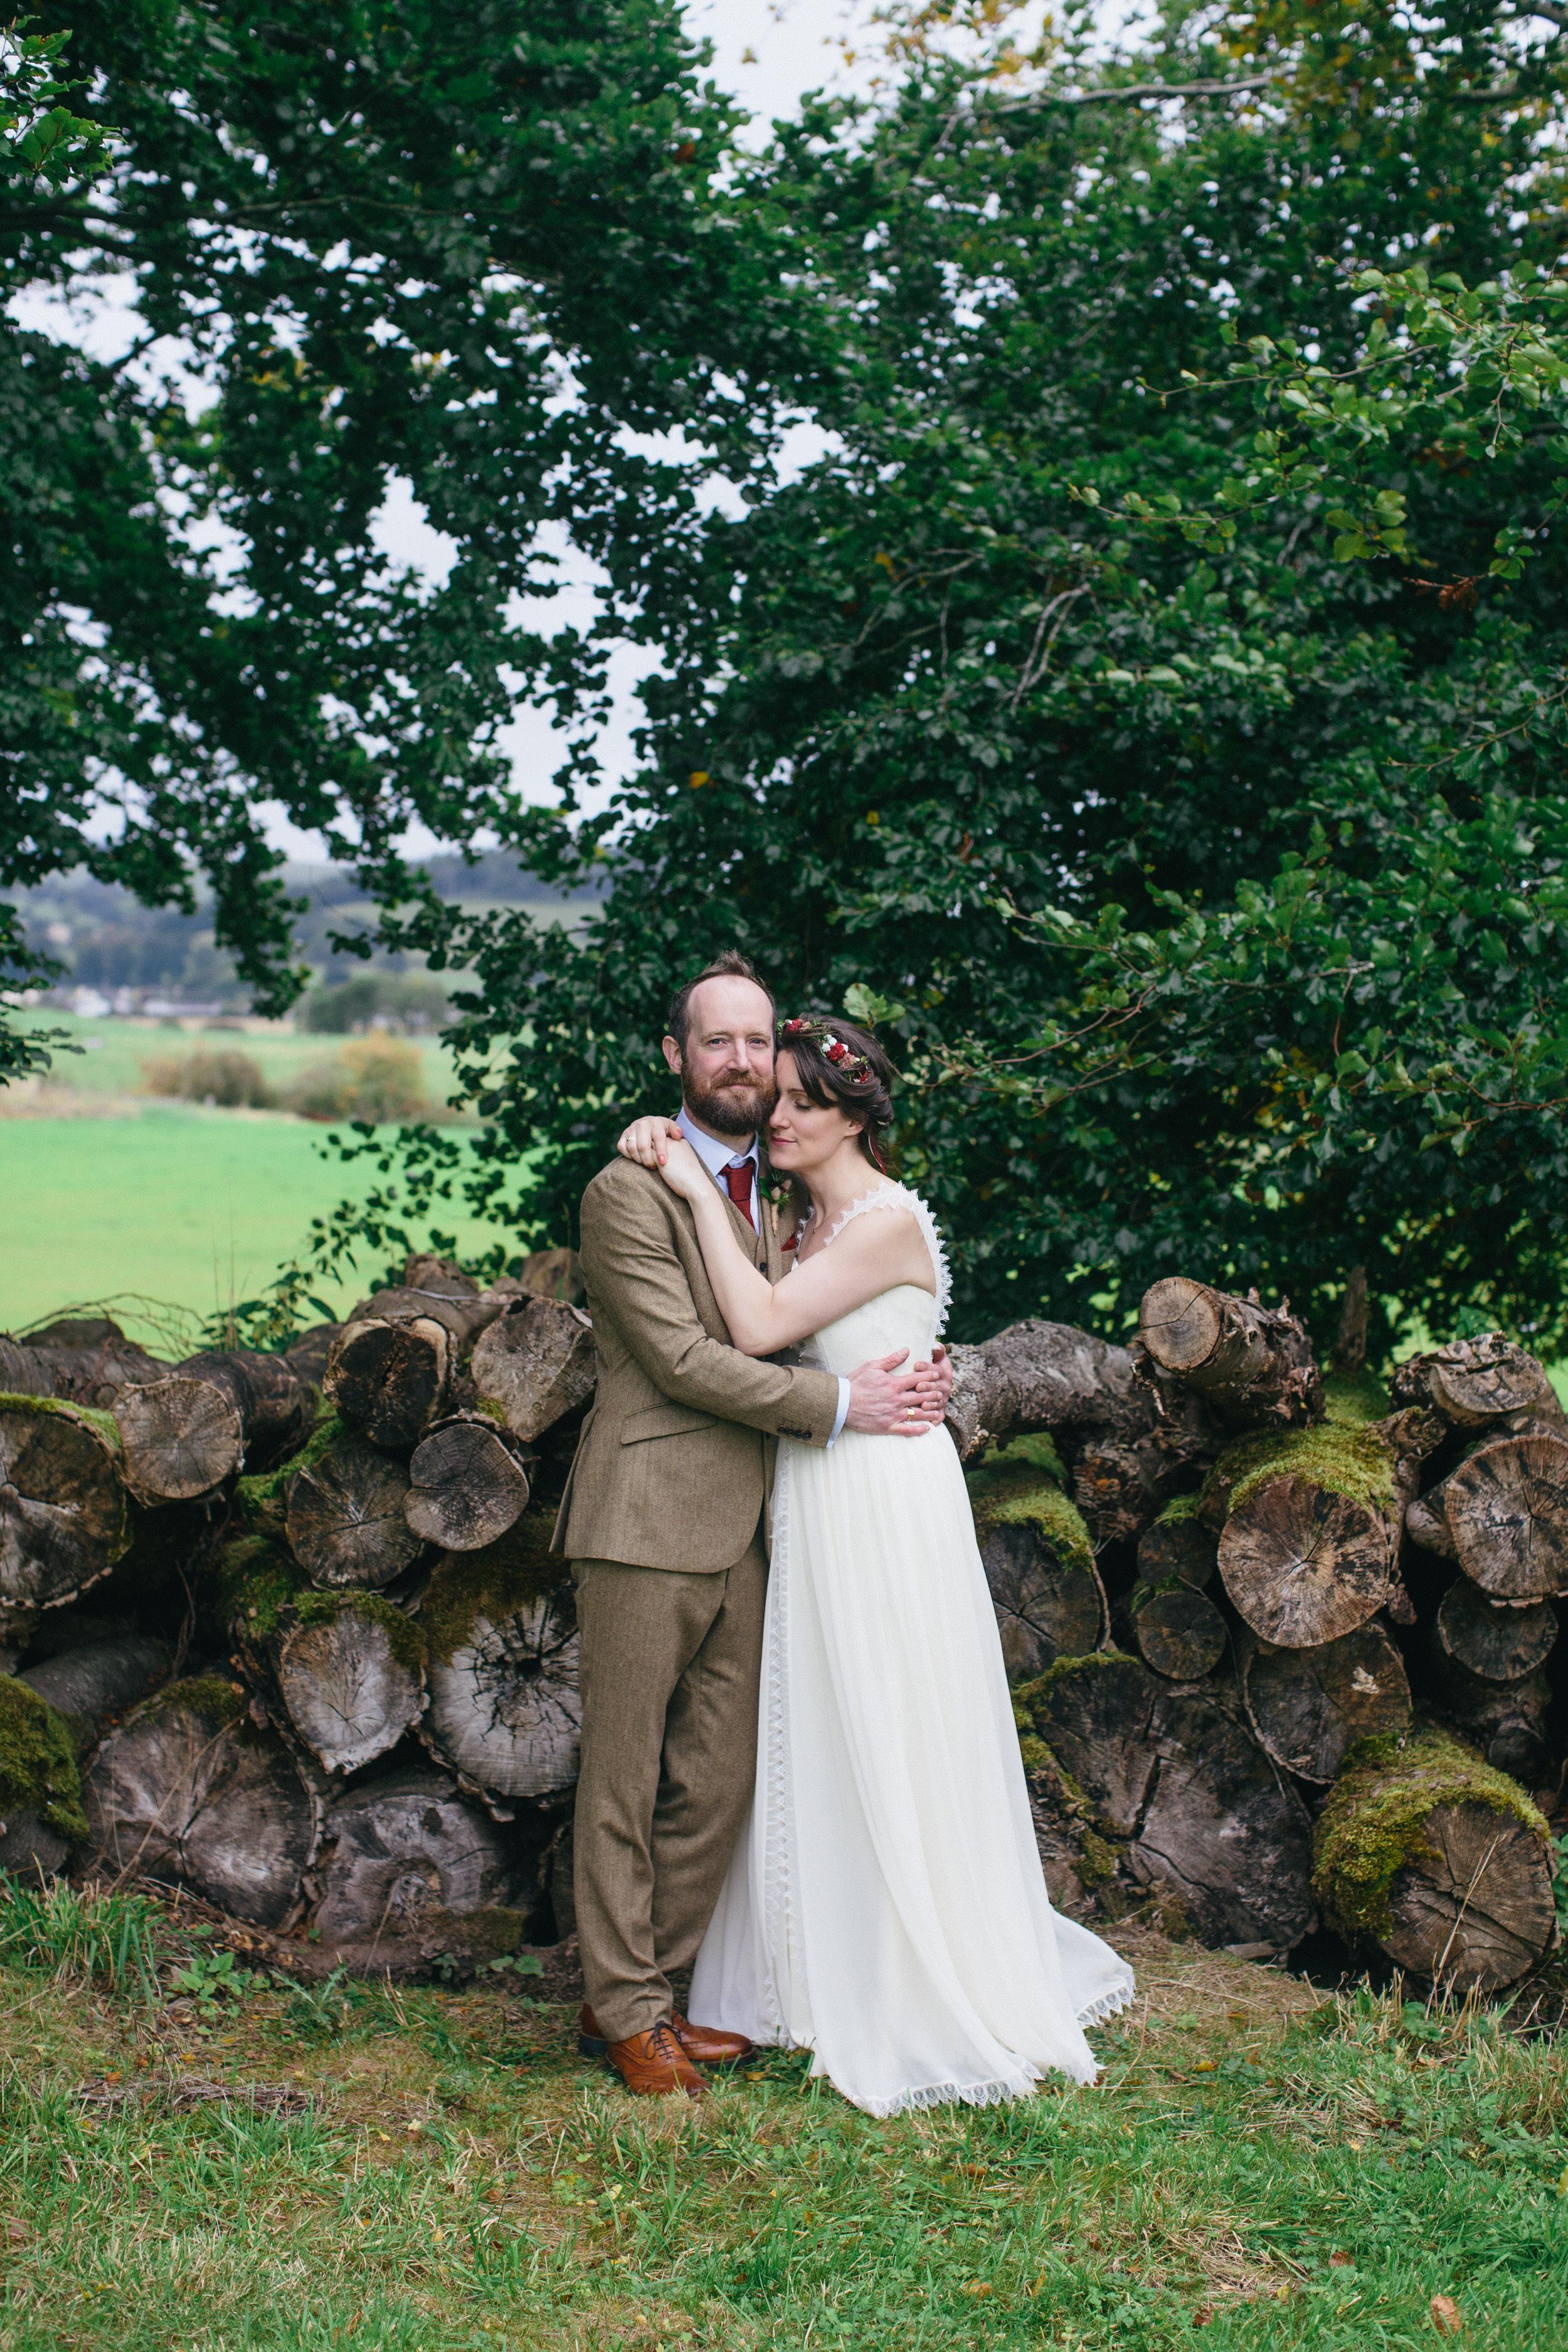 Quirky Wedding Photography Scotland Borders Biggar Hartree 065.jpg